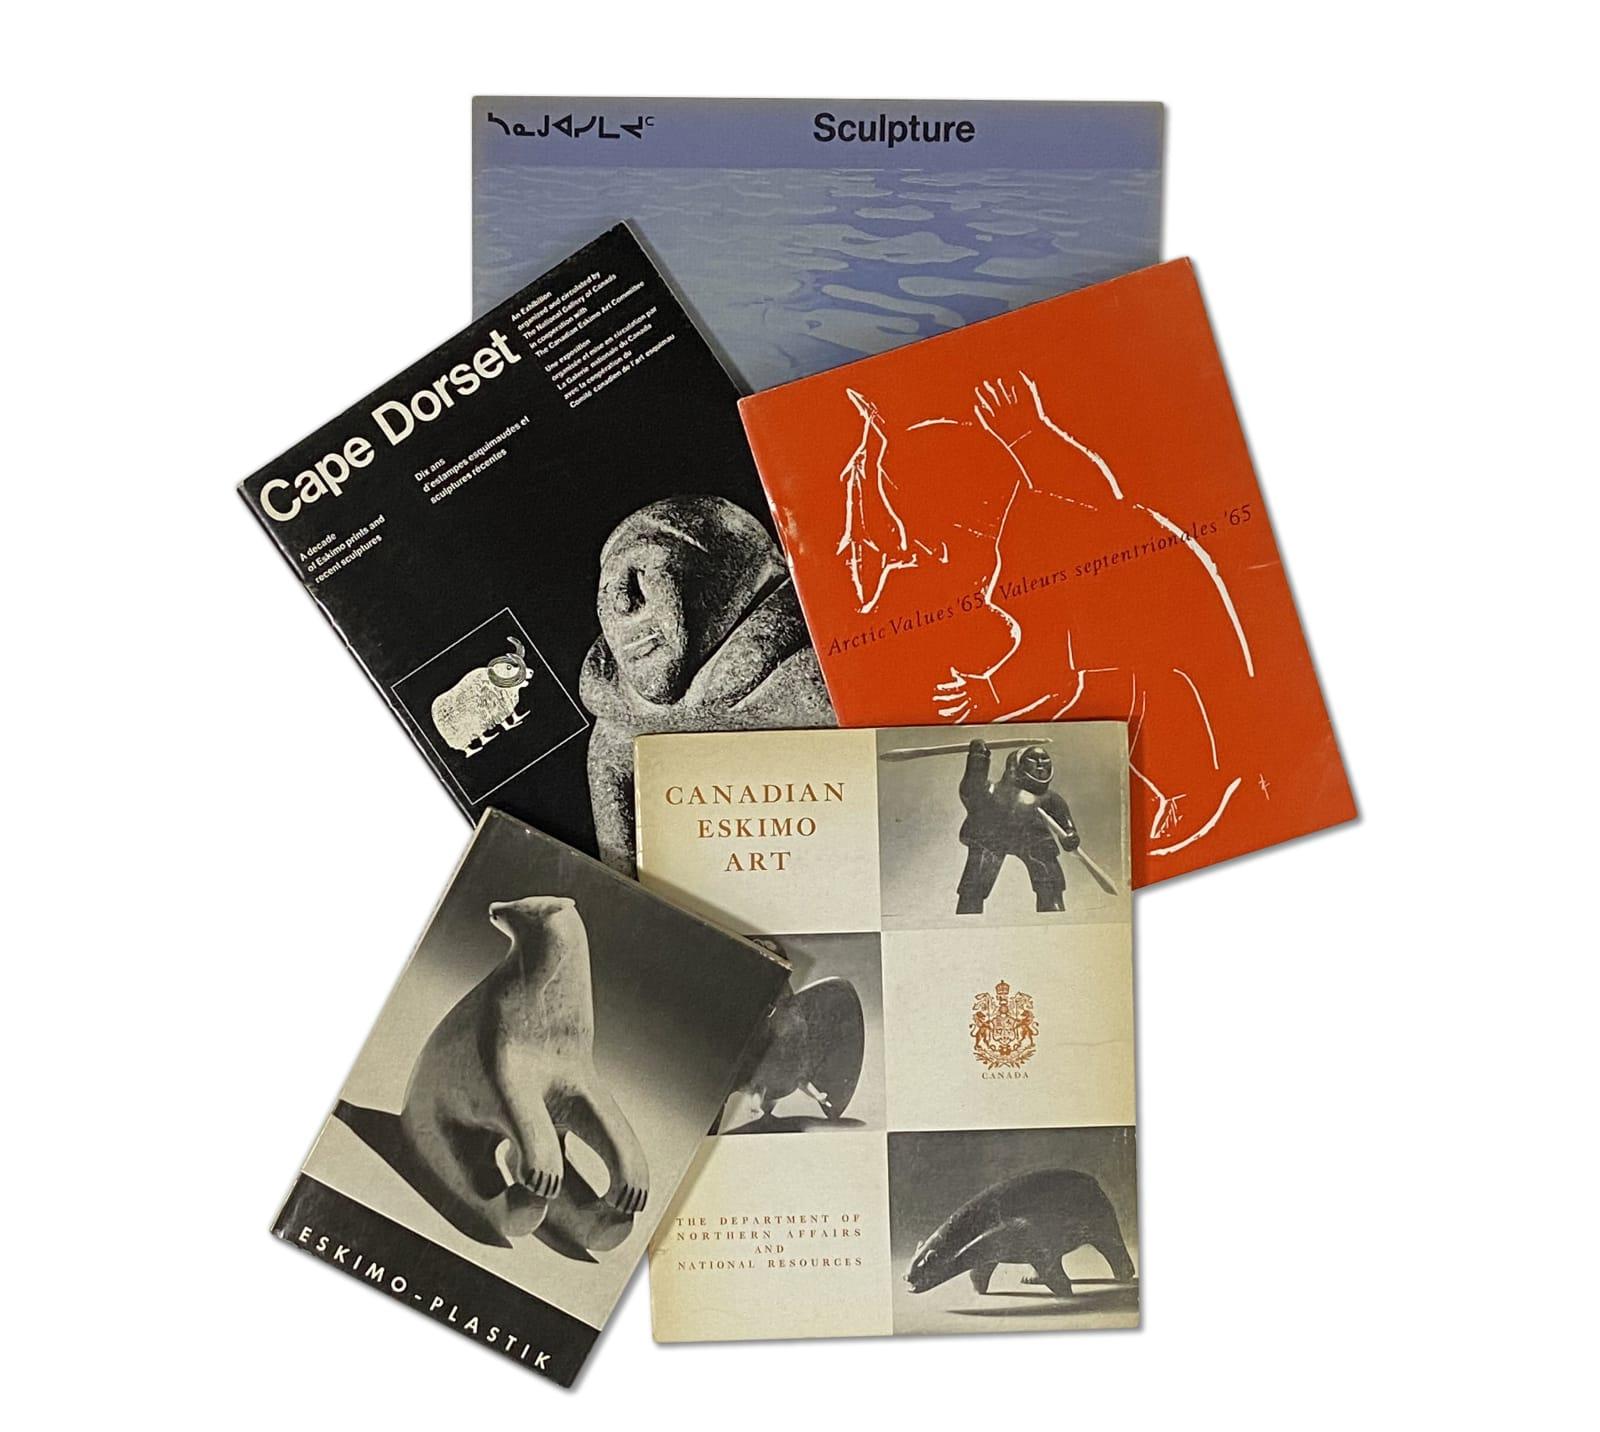 Lot 85 Quantity of Inuit Art Publications Estimate: $100 — $150 PRICE REALIZED: $120